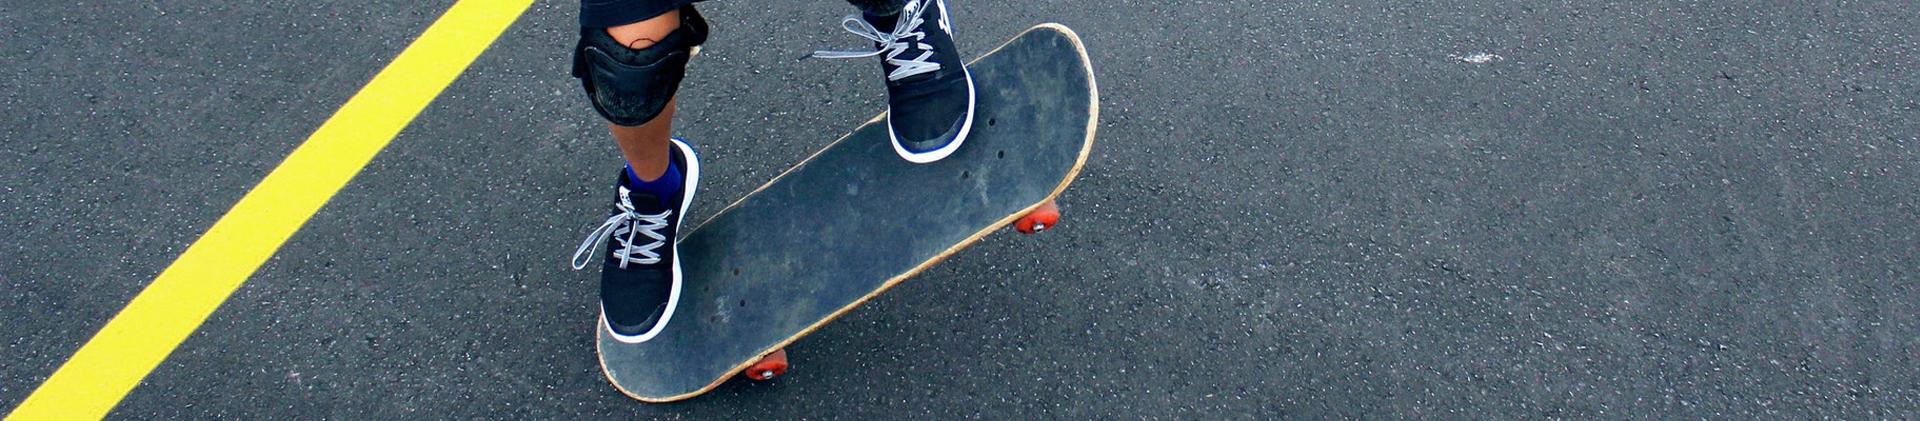 skateboarding-camps